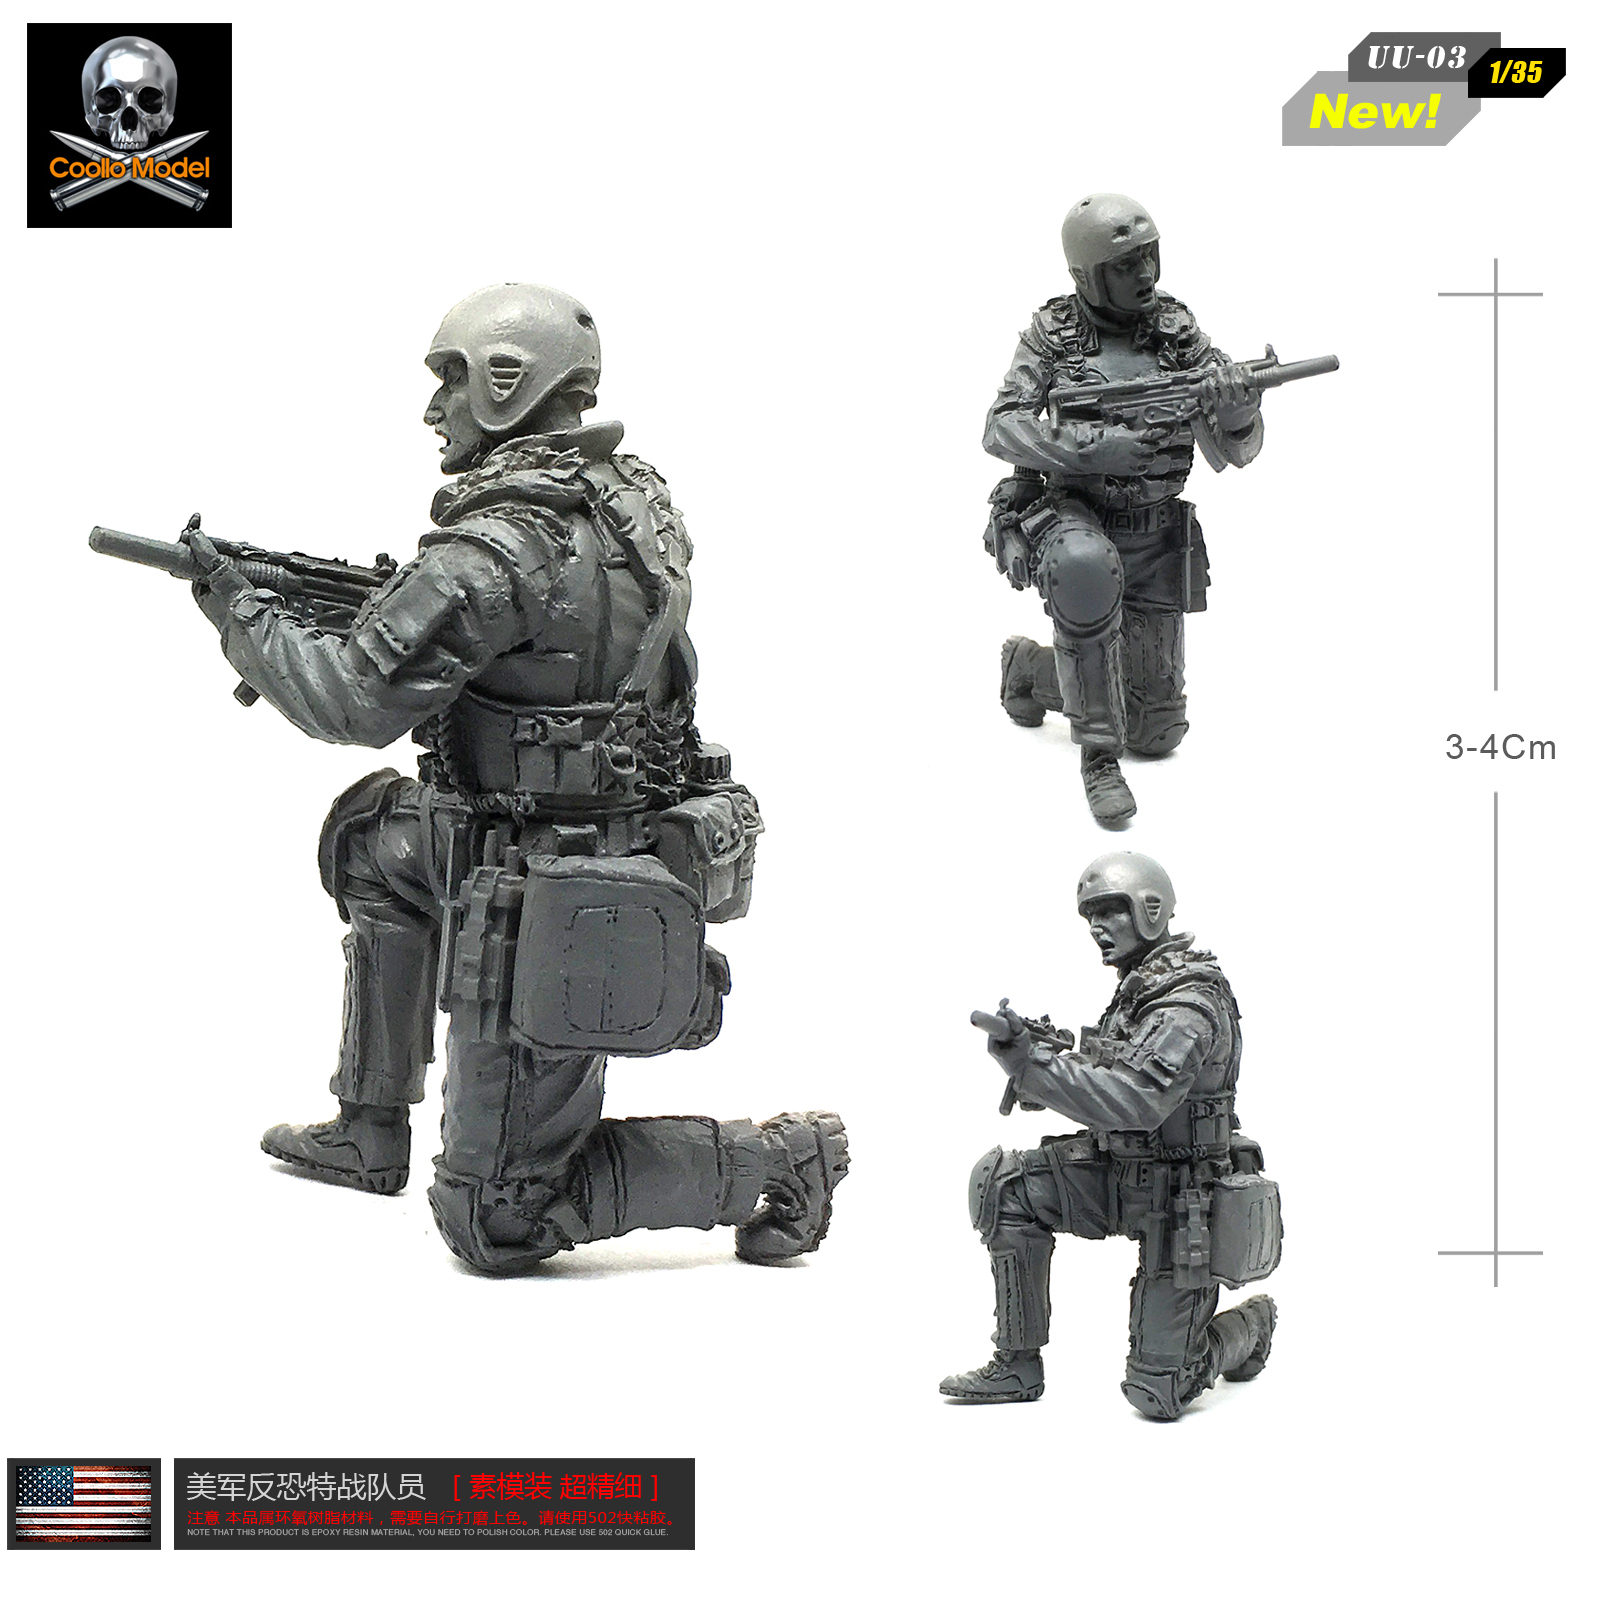 1/35 Model Kits U.s. Special Forces Anti-terrorism Elite Resin Soldier Uu-03 Fashionable Patterns